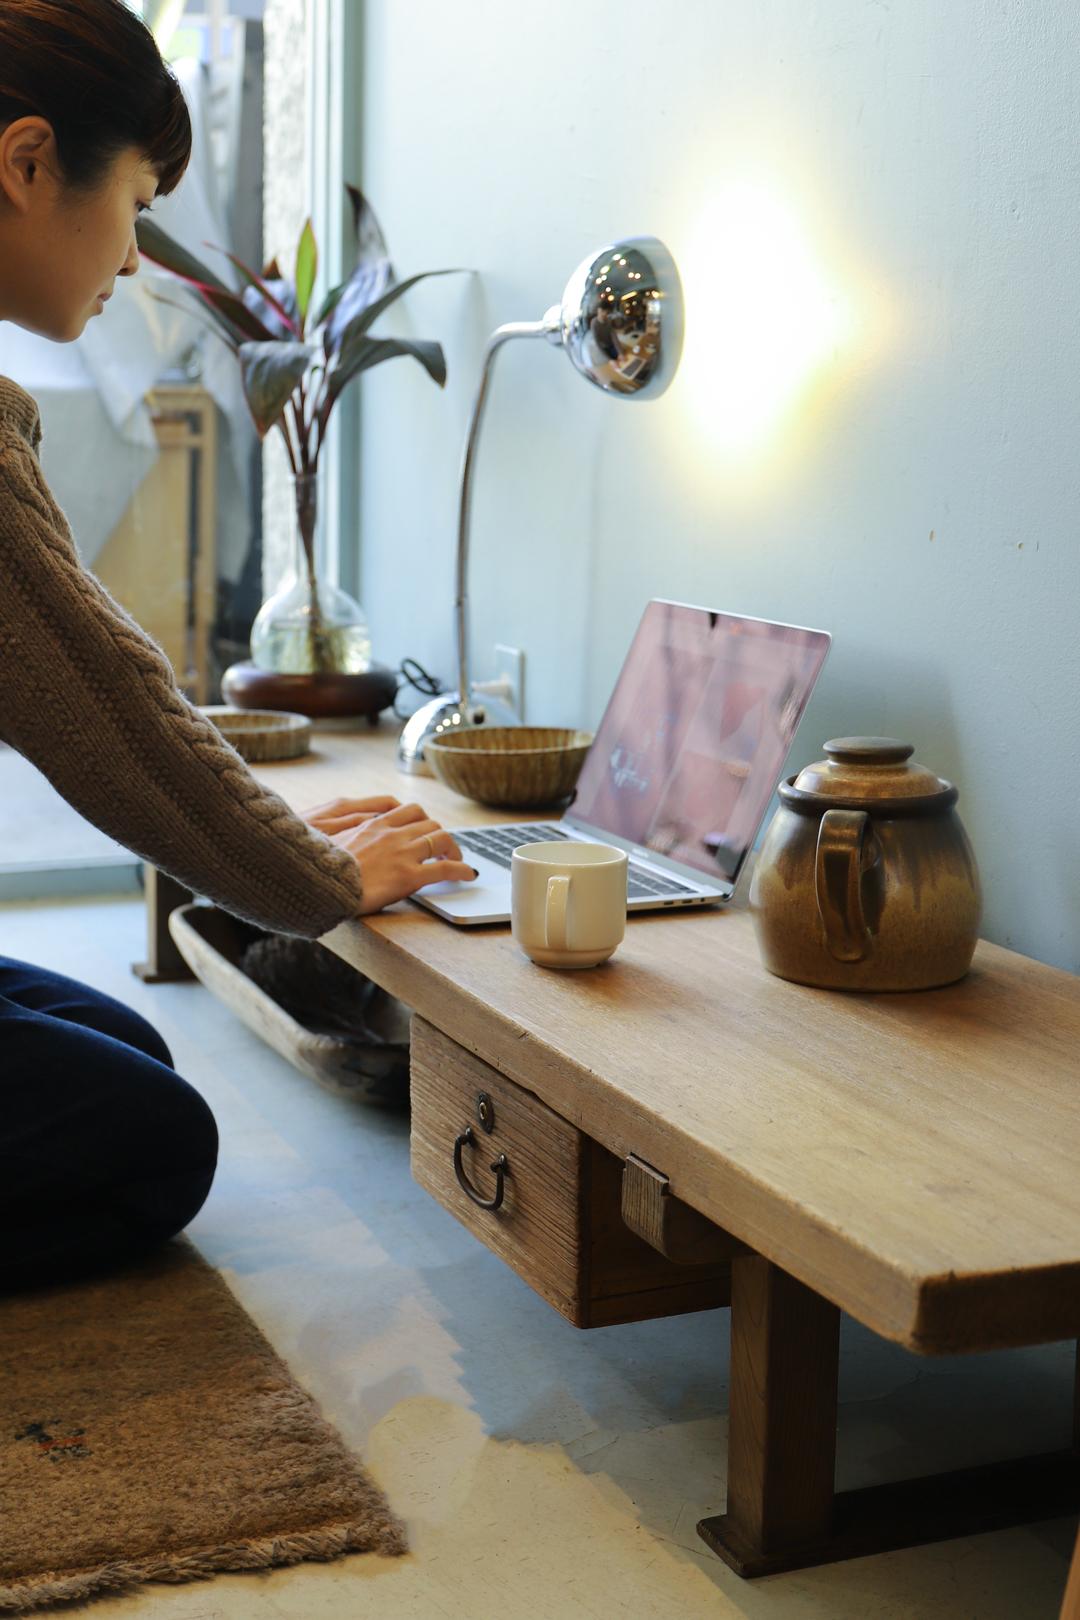 Japanese Vintage Wooden Low Board/ジャパンヴィンテージ ローボード 裁ち台 テレビ台 引き出し 古道具 時代家具